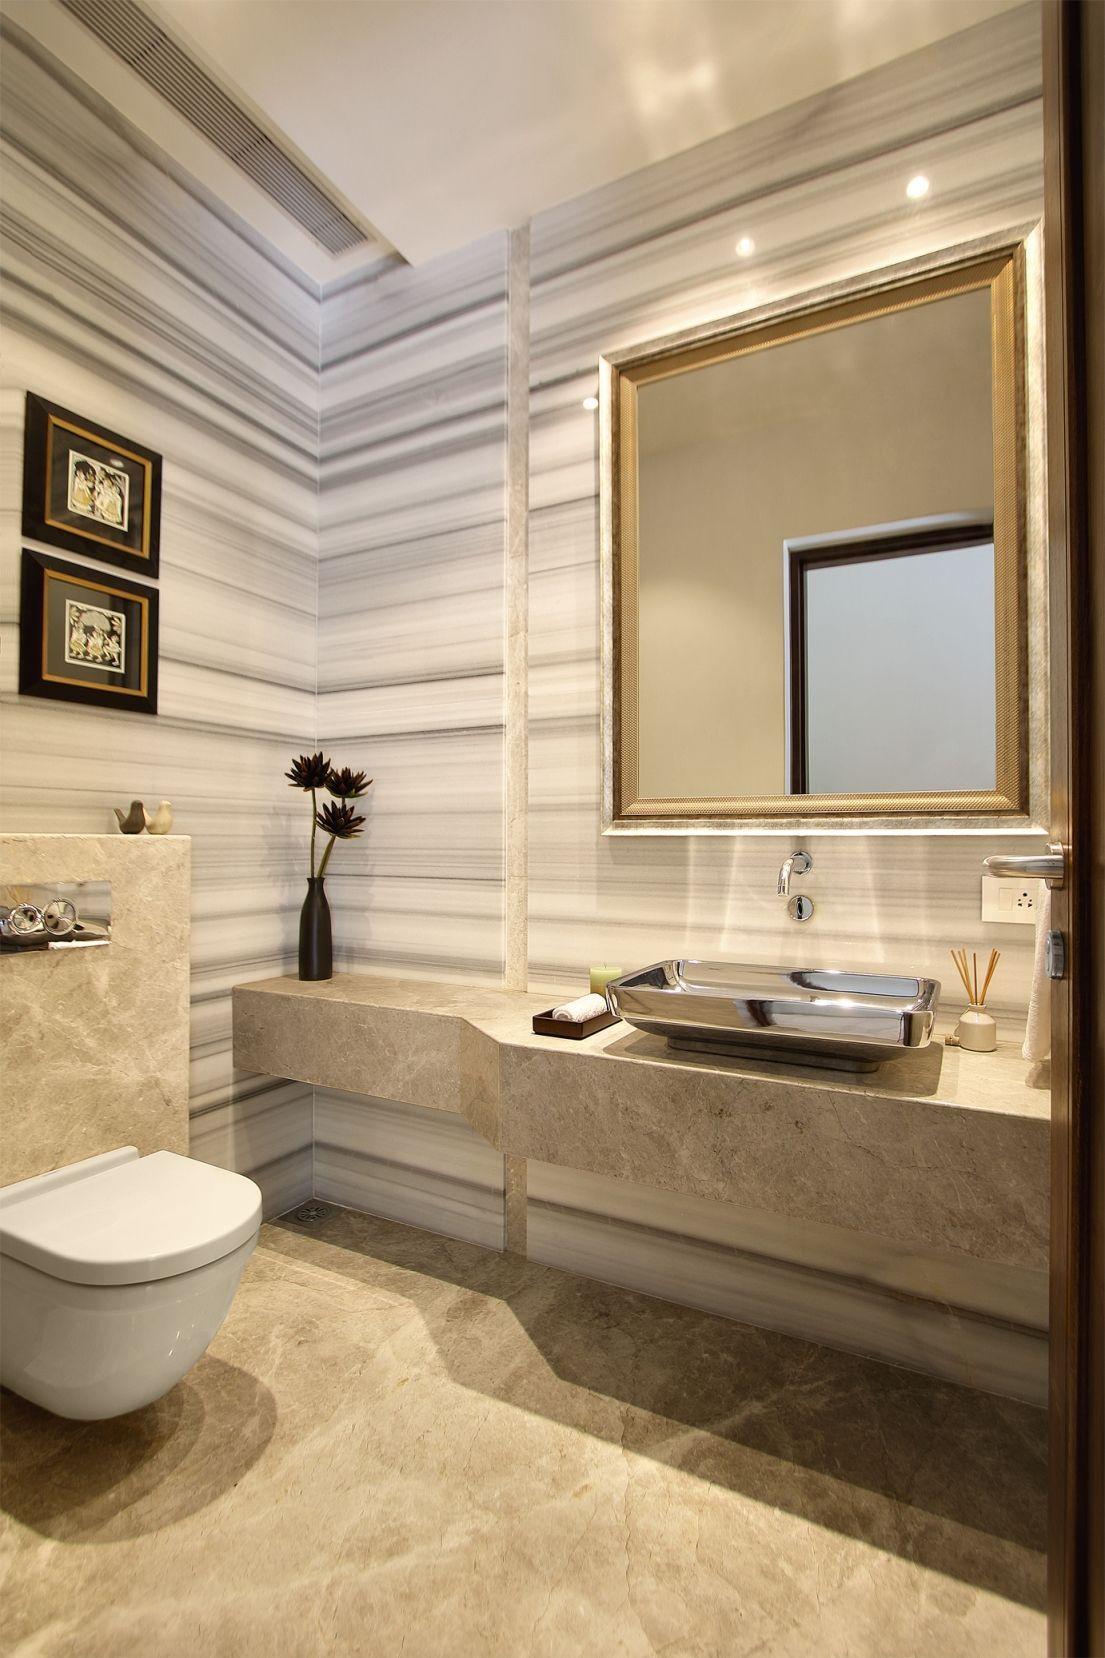 EXQUISITE DESIGN BY ARCHITECT DIPIN GADA /India ...